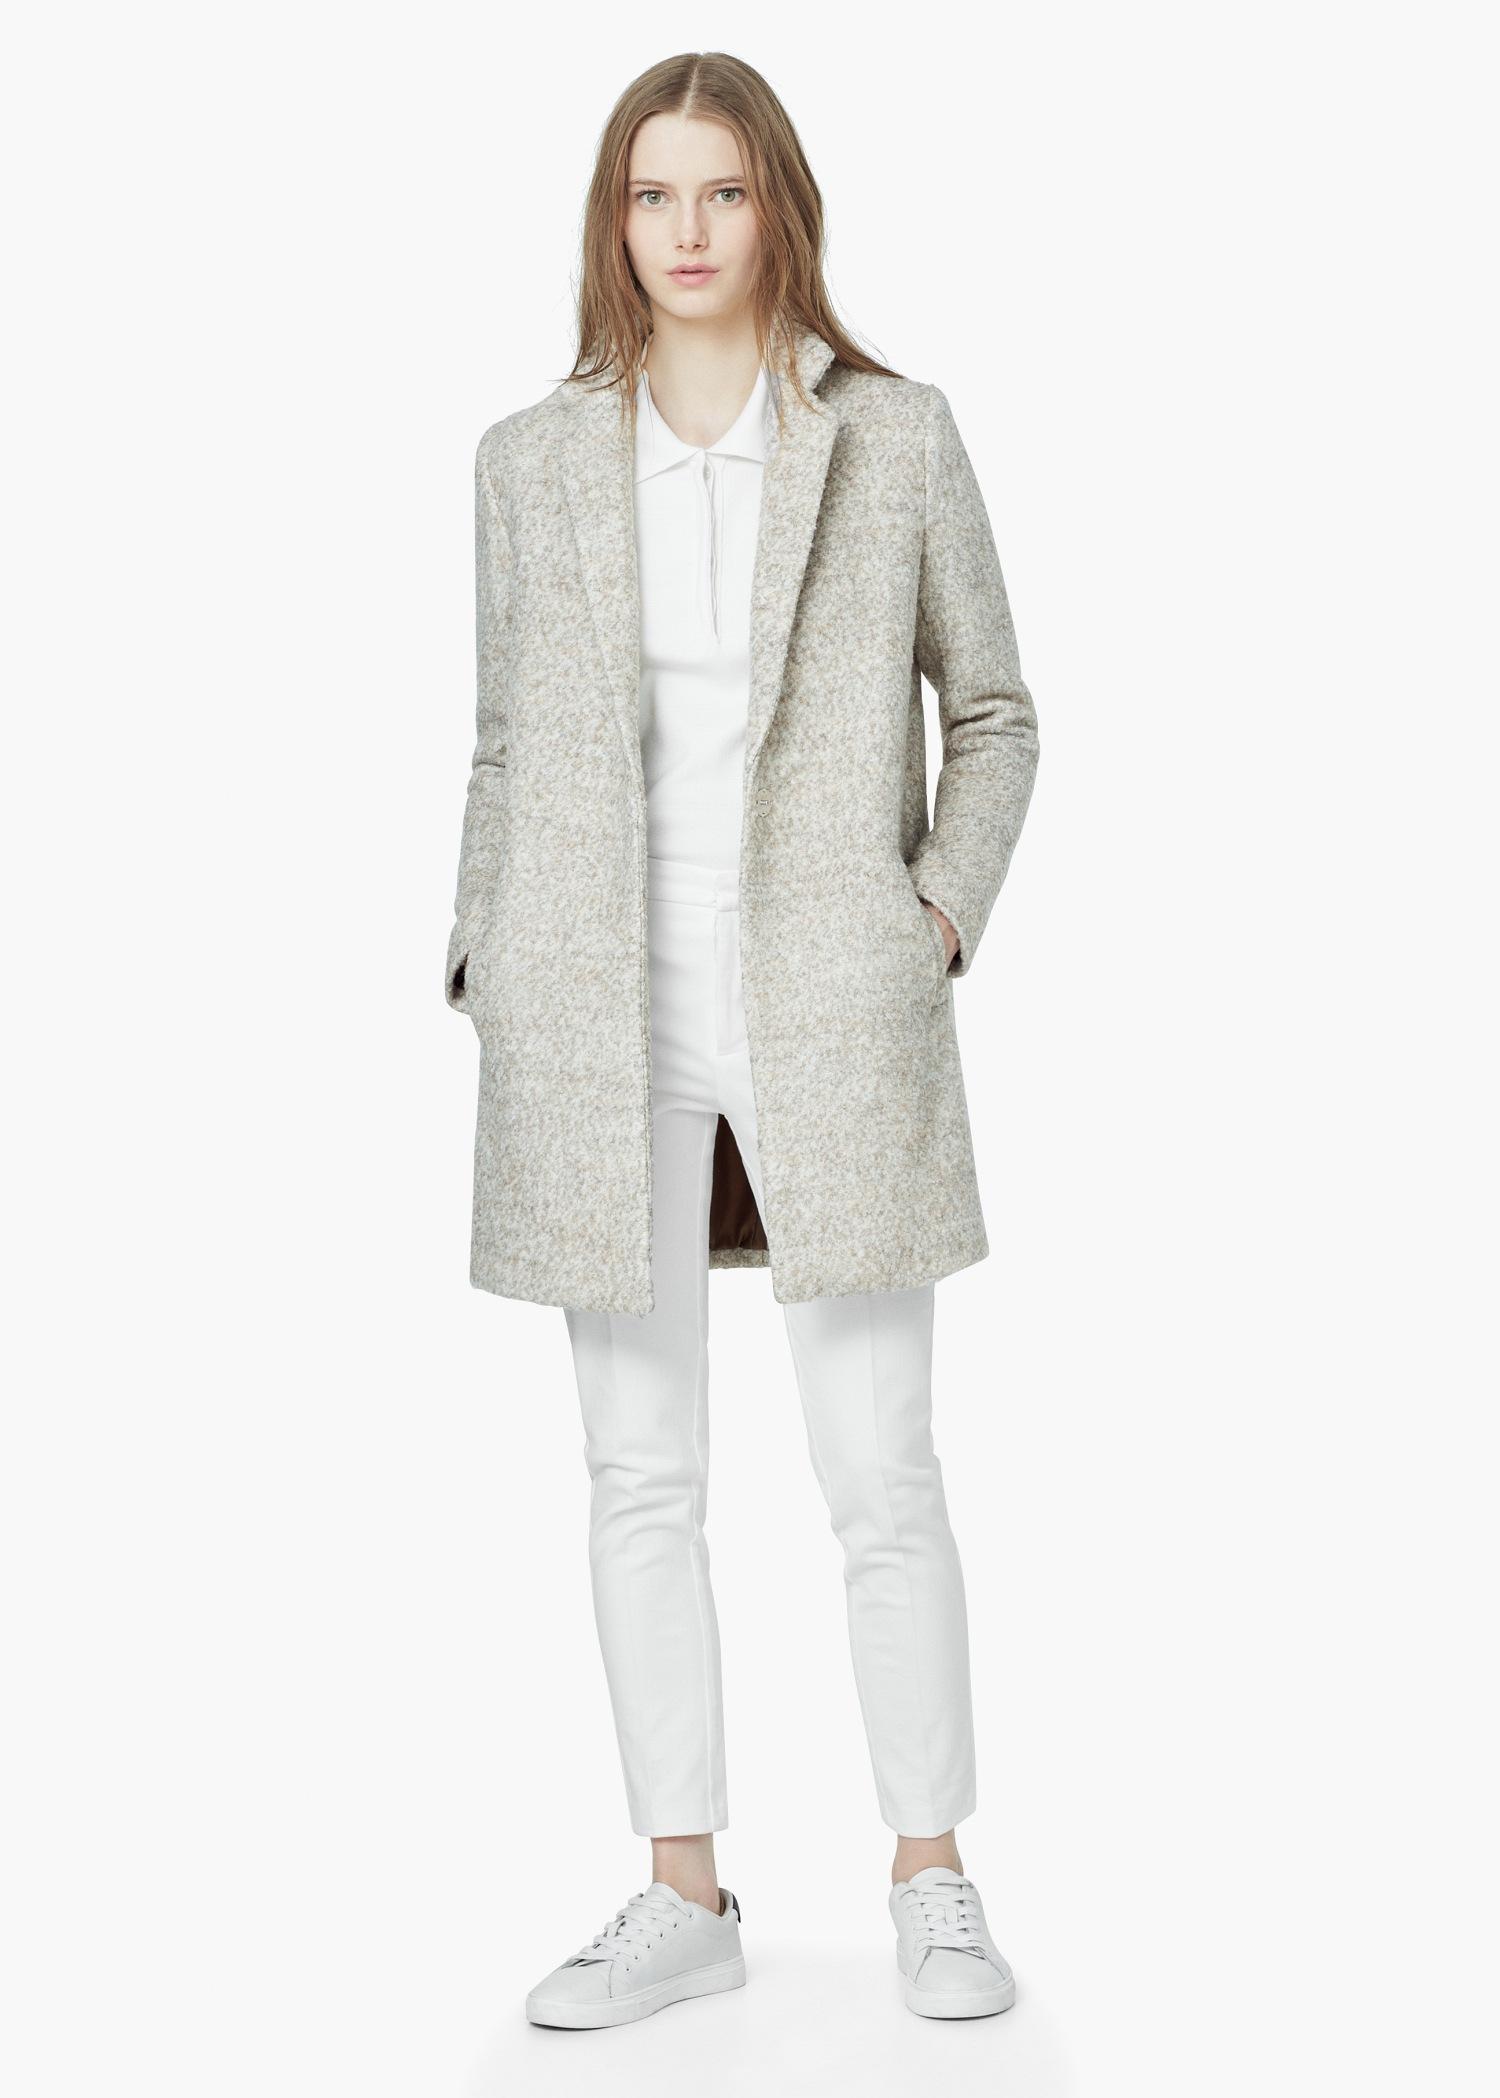 Mango Bouclé Wool Coat in Natural | Lyst